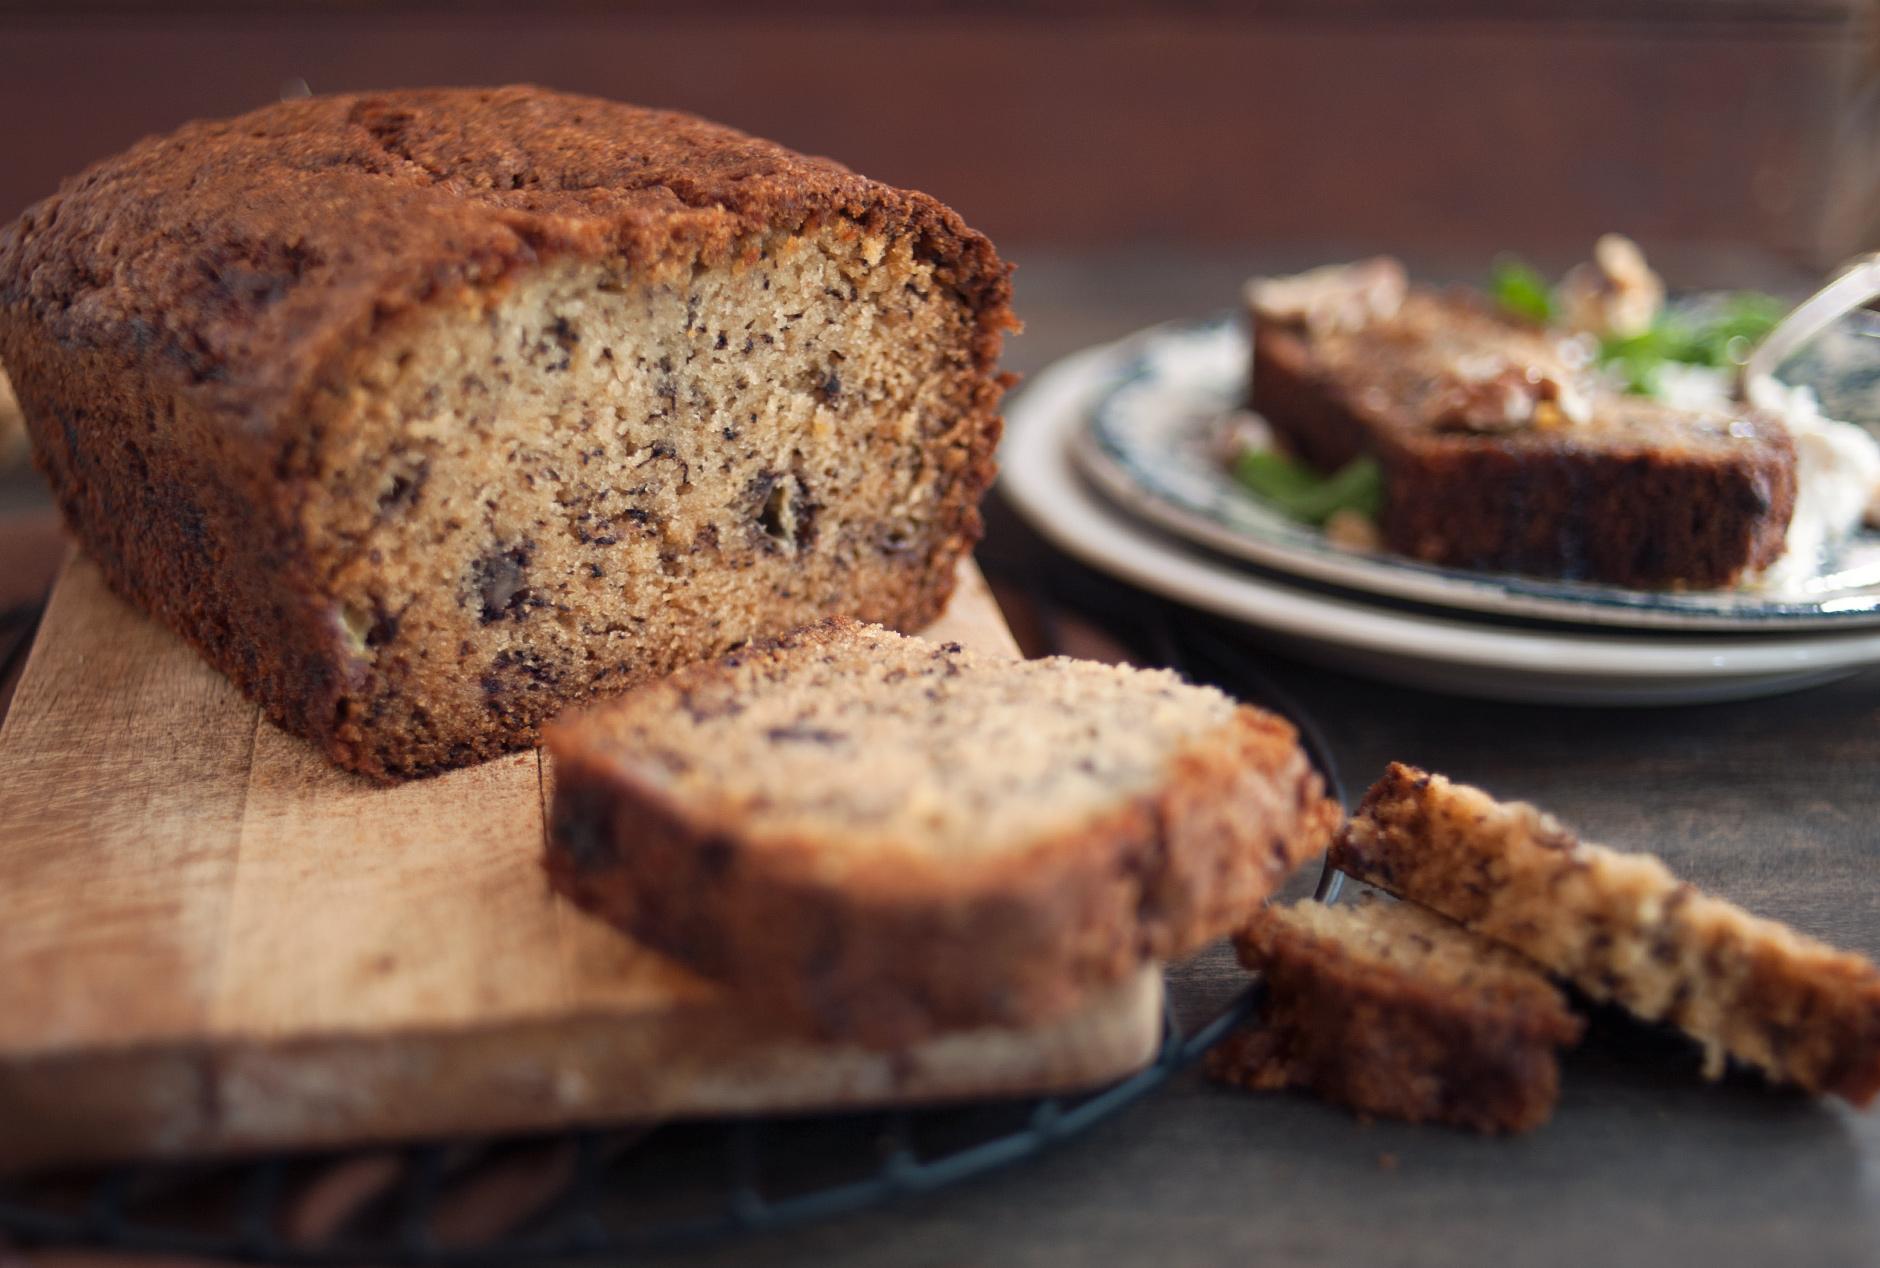 pulbican_banana_bread_food_photography_3.jpg